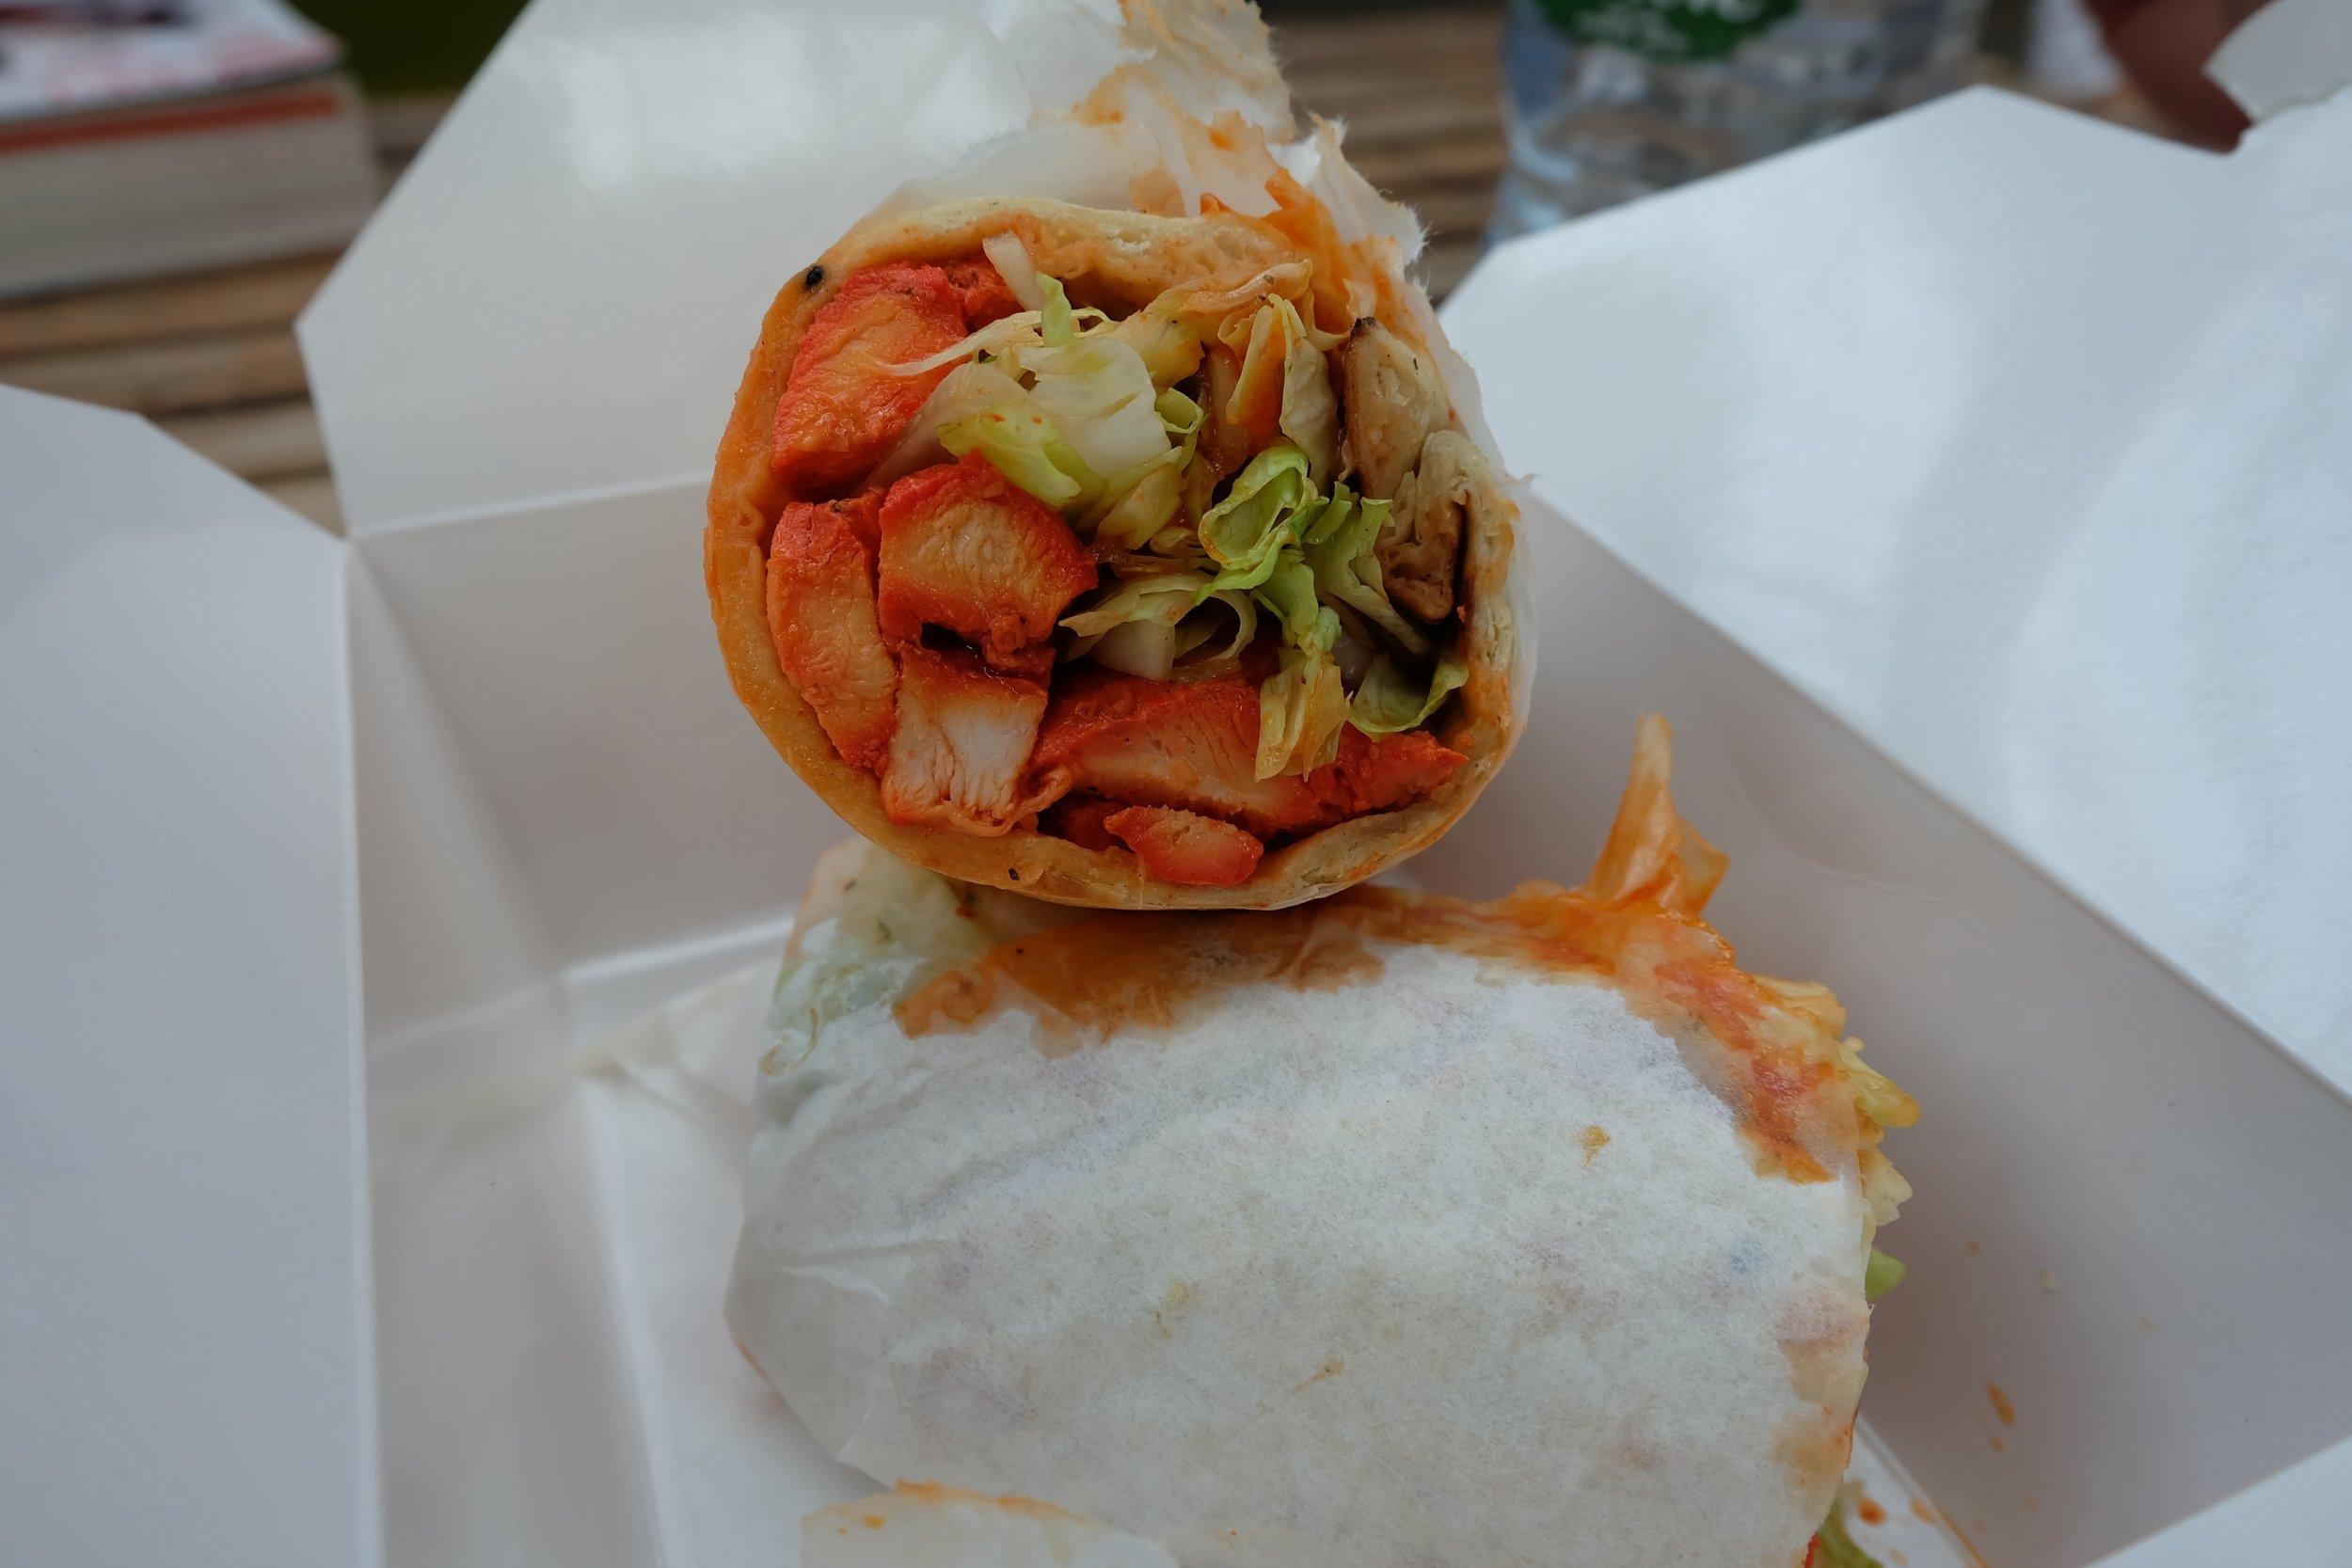 Chicken tikka wrap from Indi-Go